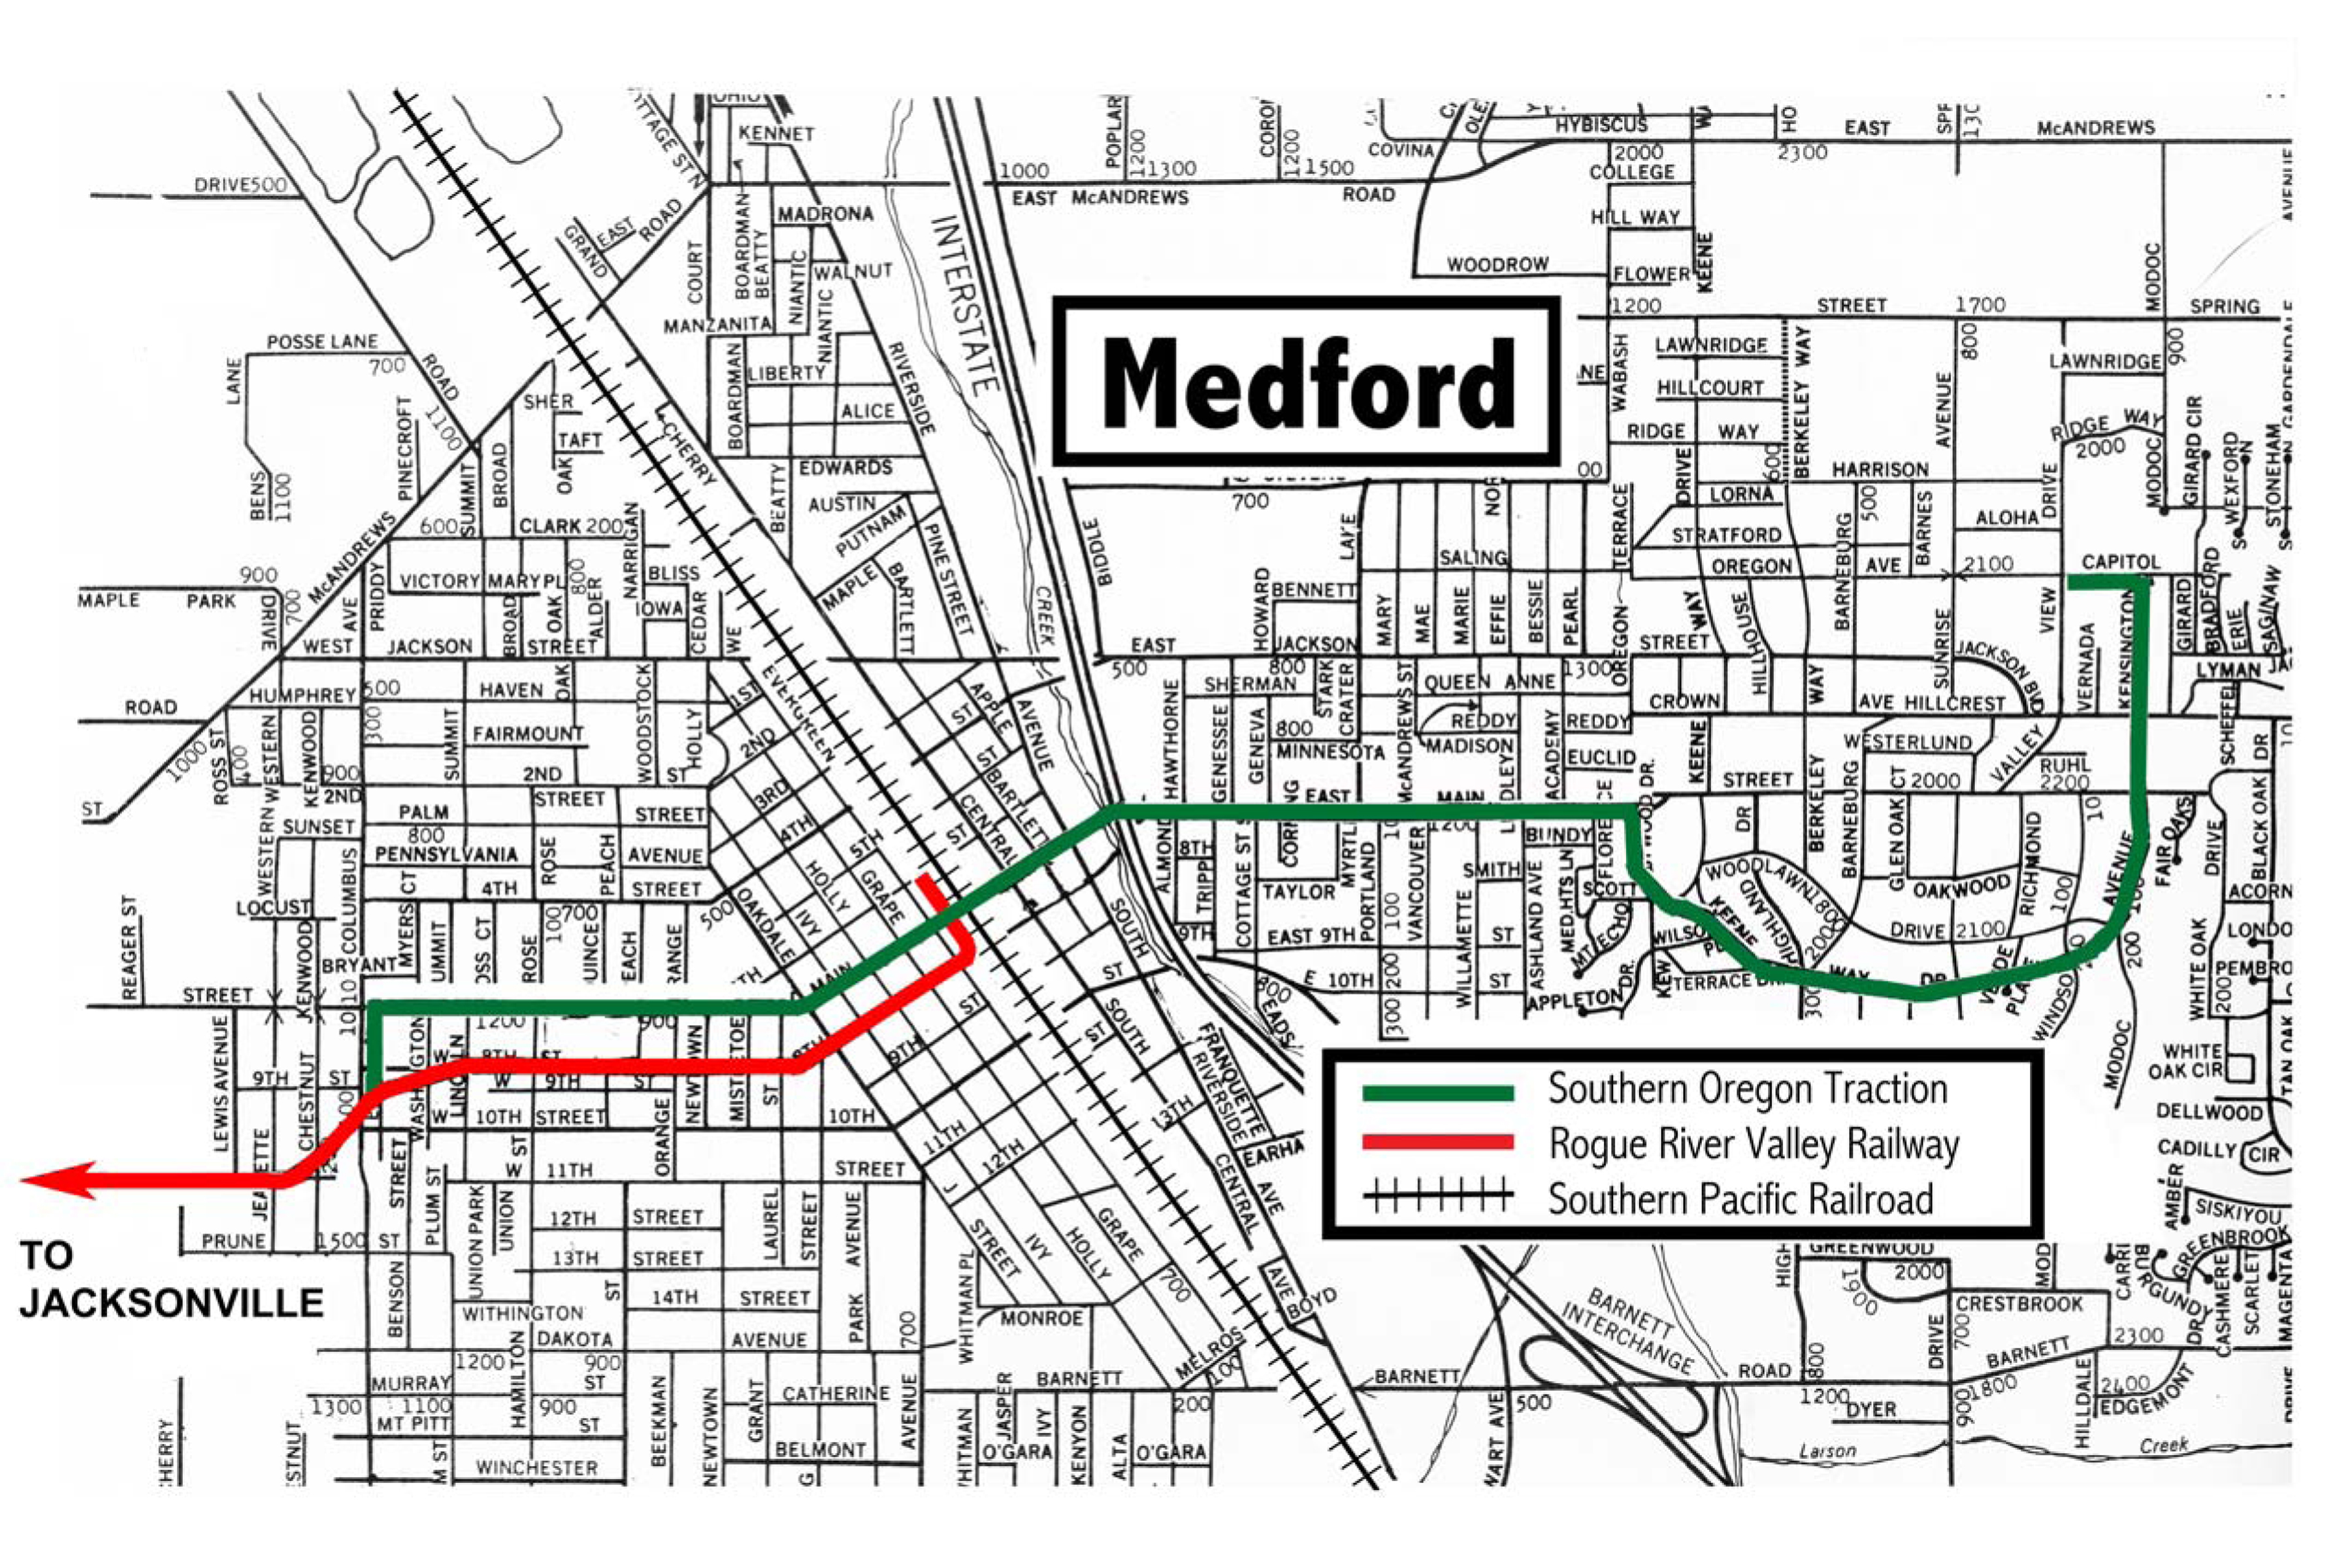 Medford Jacksonville Streetcar System